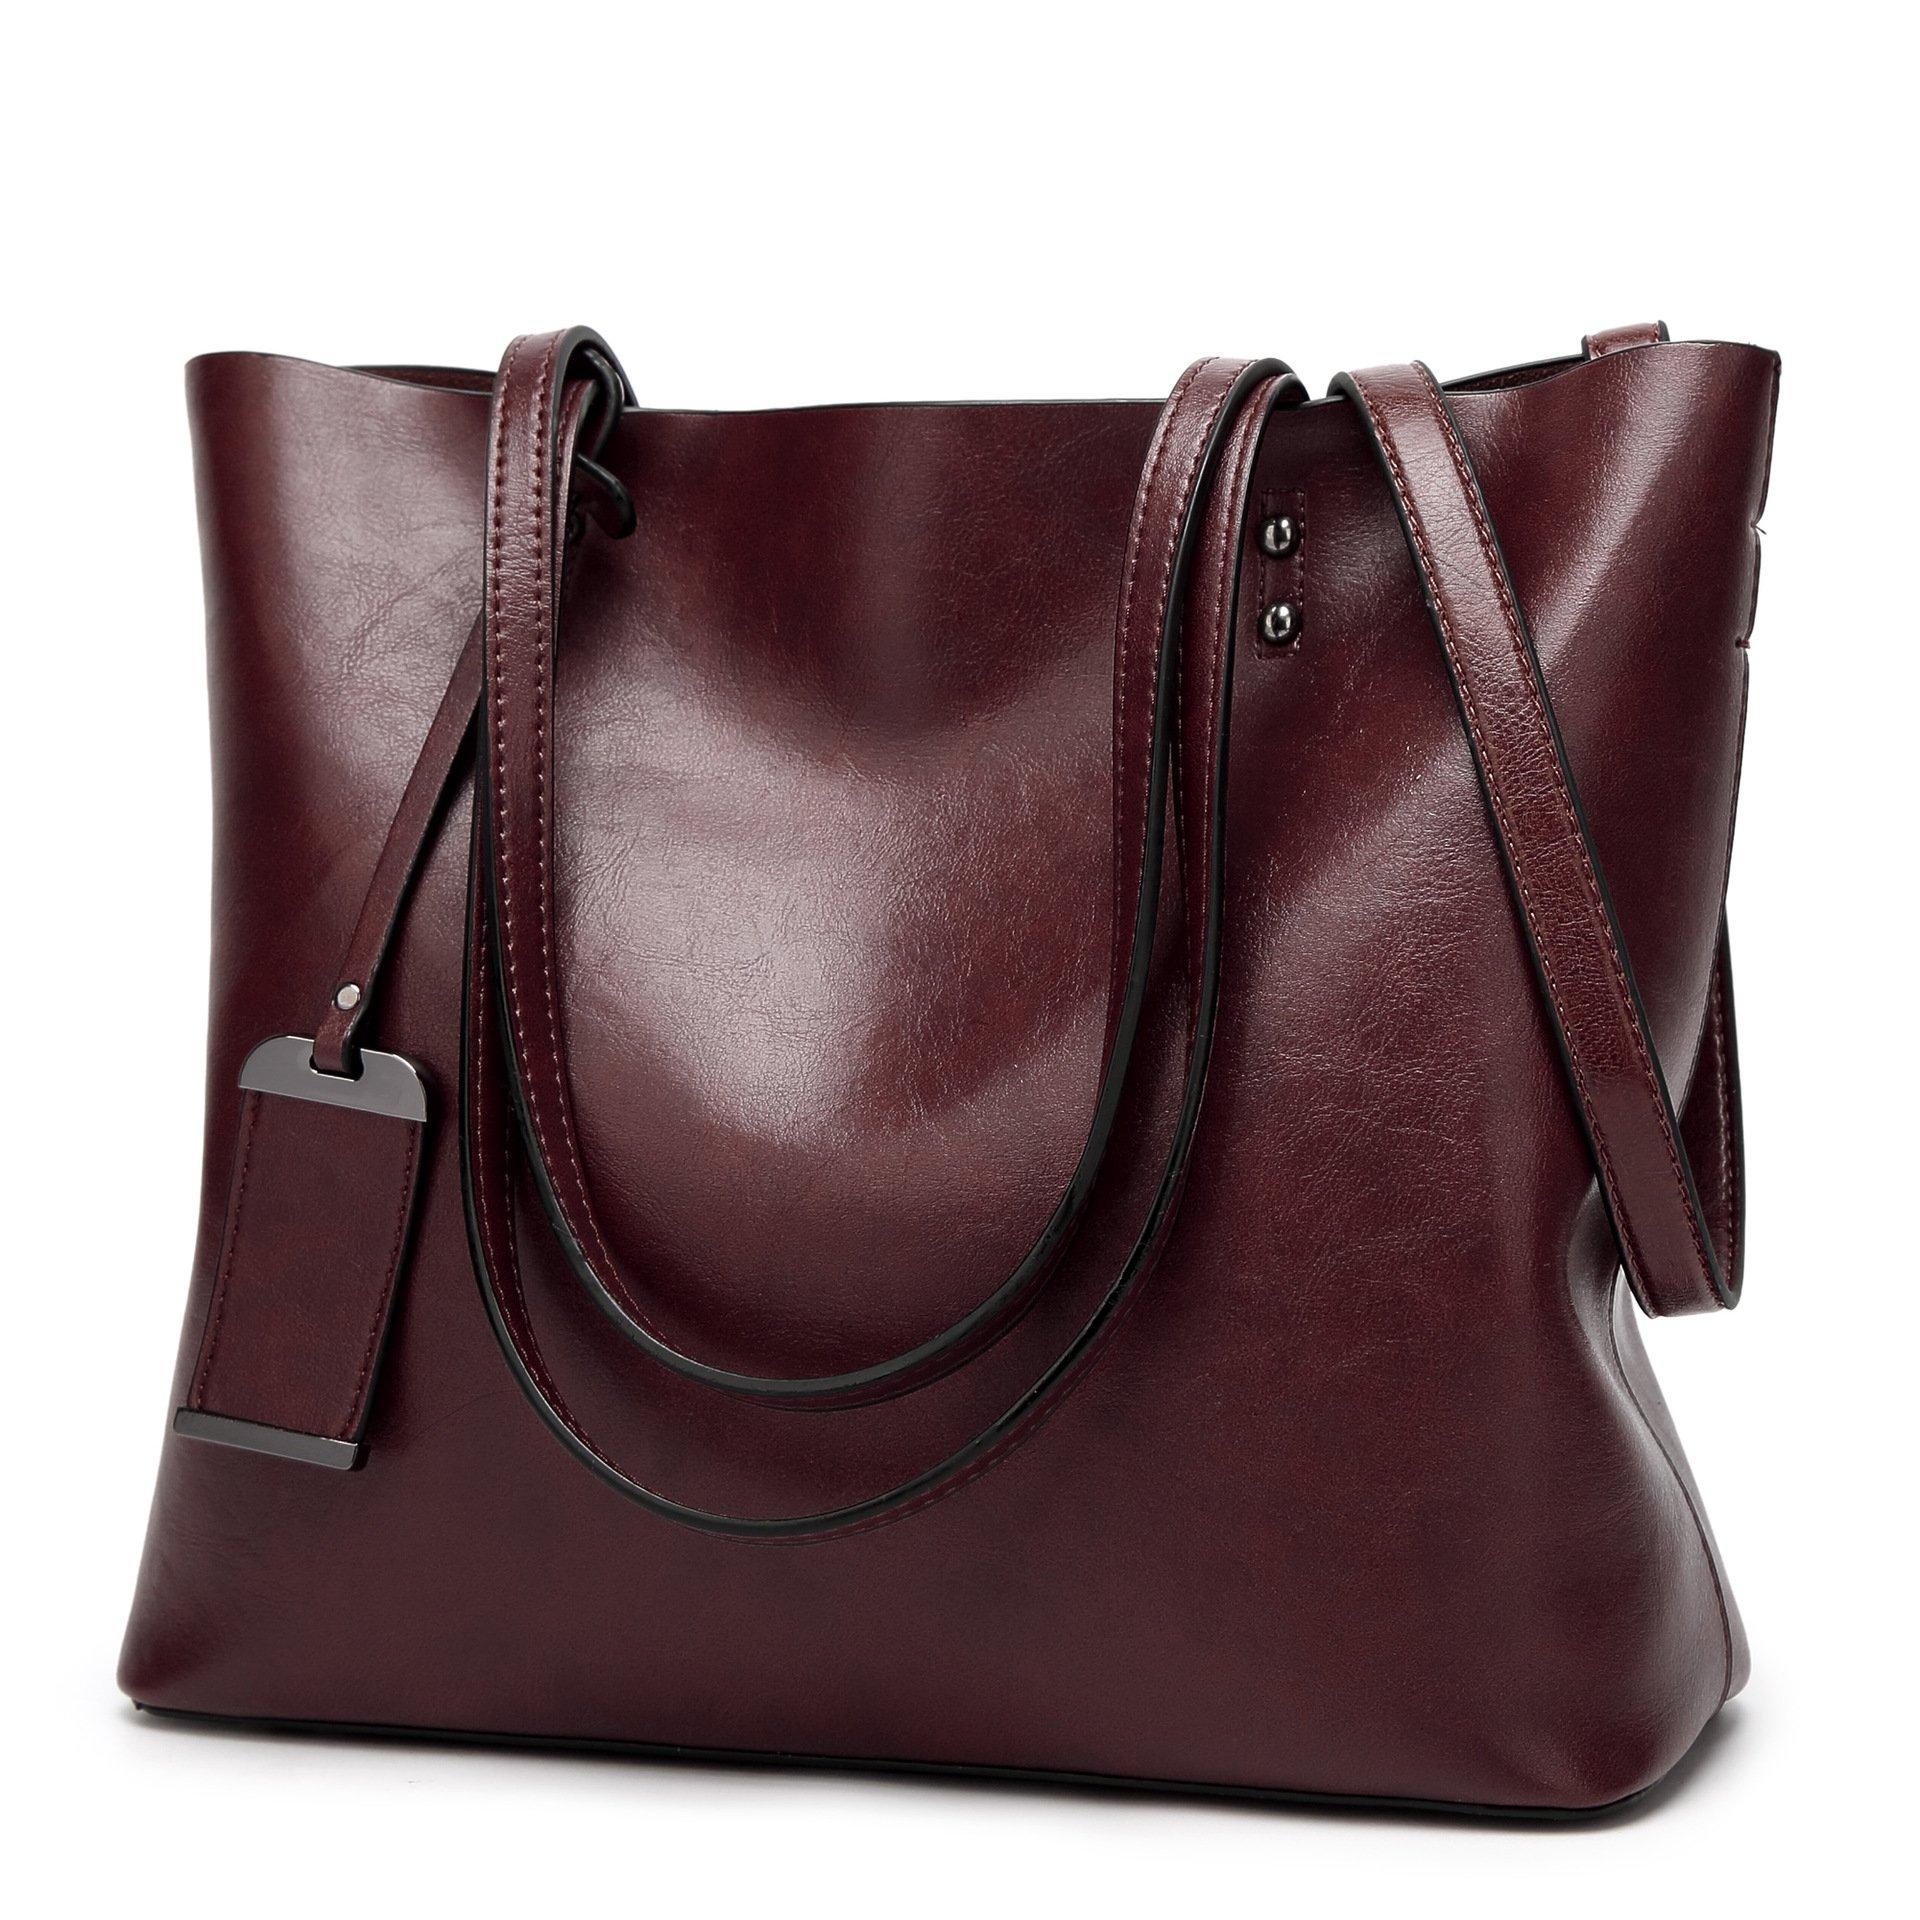 Obosoyo Women Shoulder Tote Satchel Bag Lady Messenger Purse Top Handle Hobo Handbags Coffee